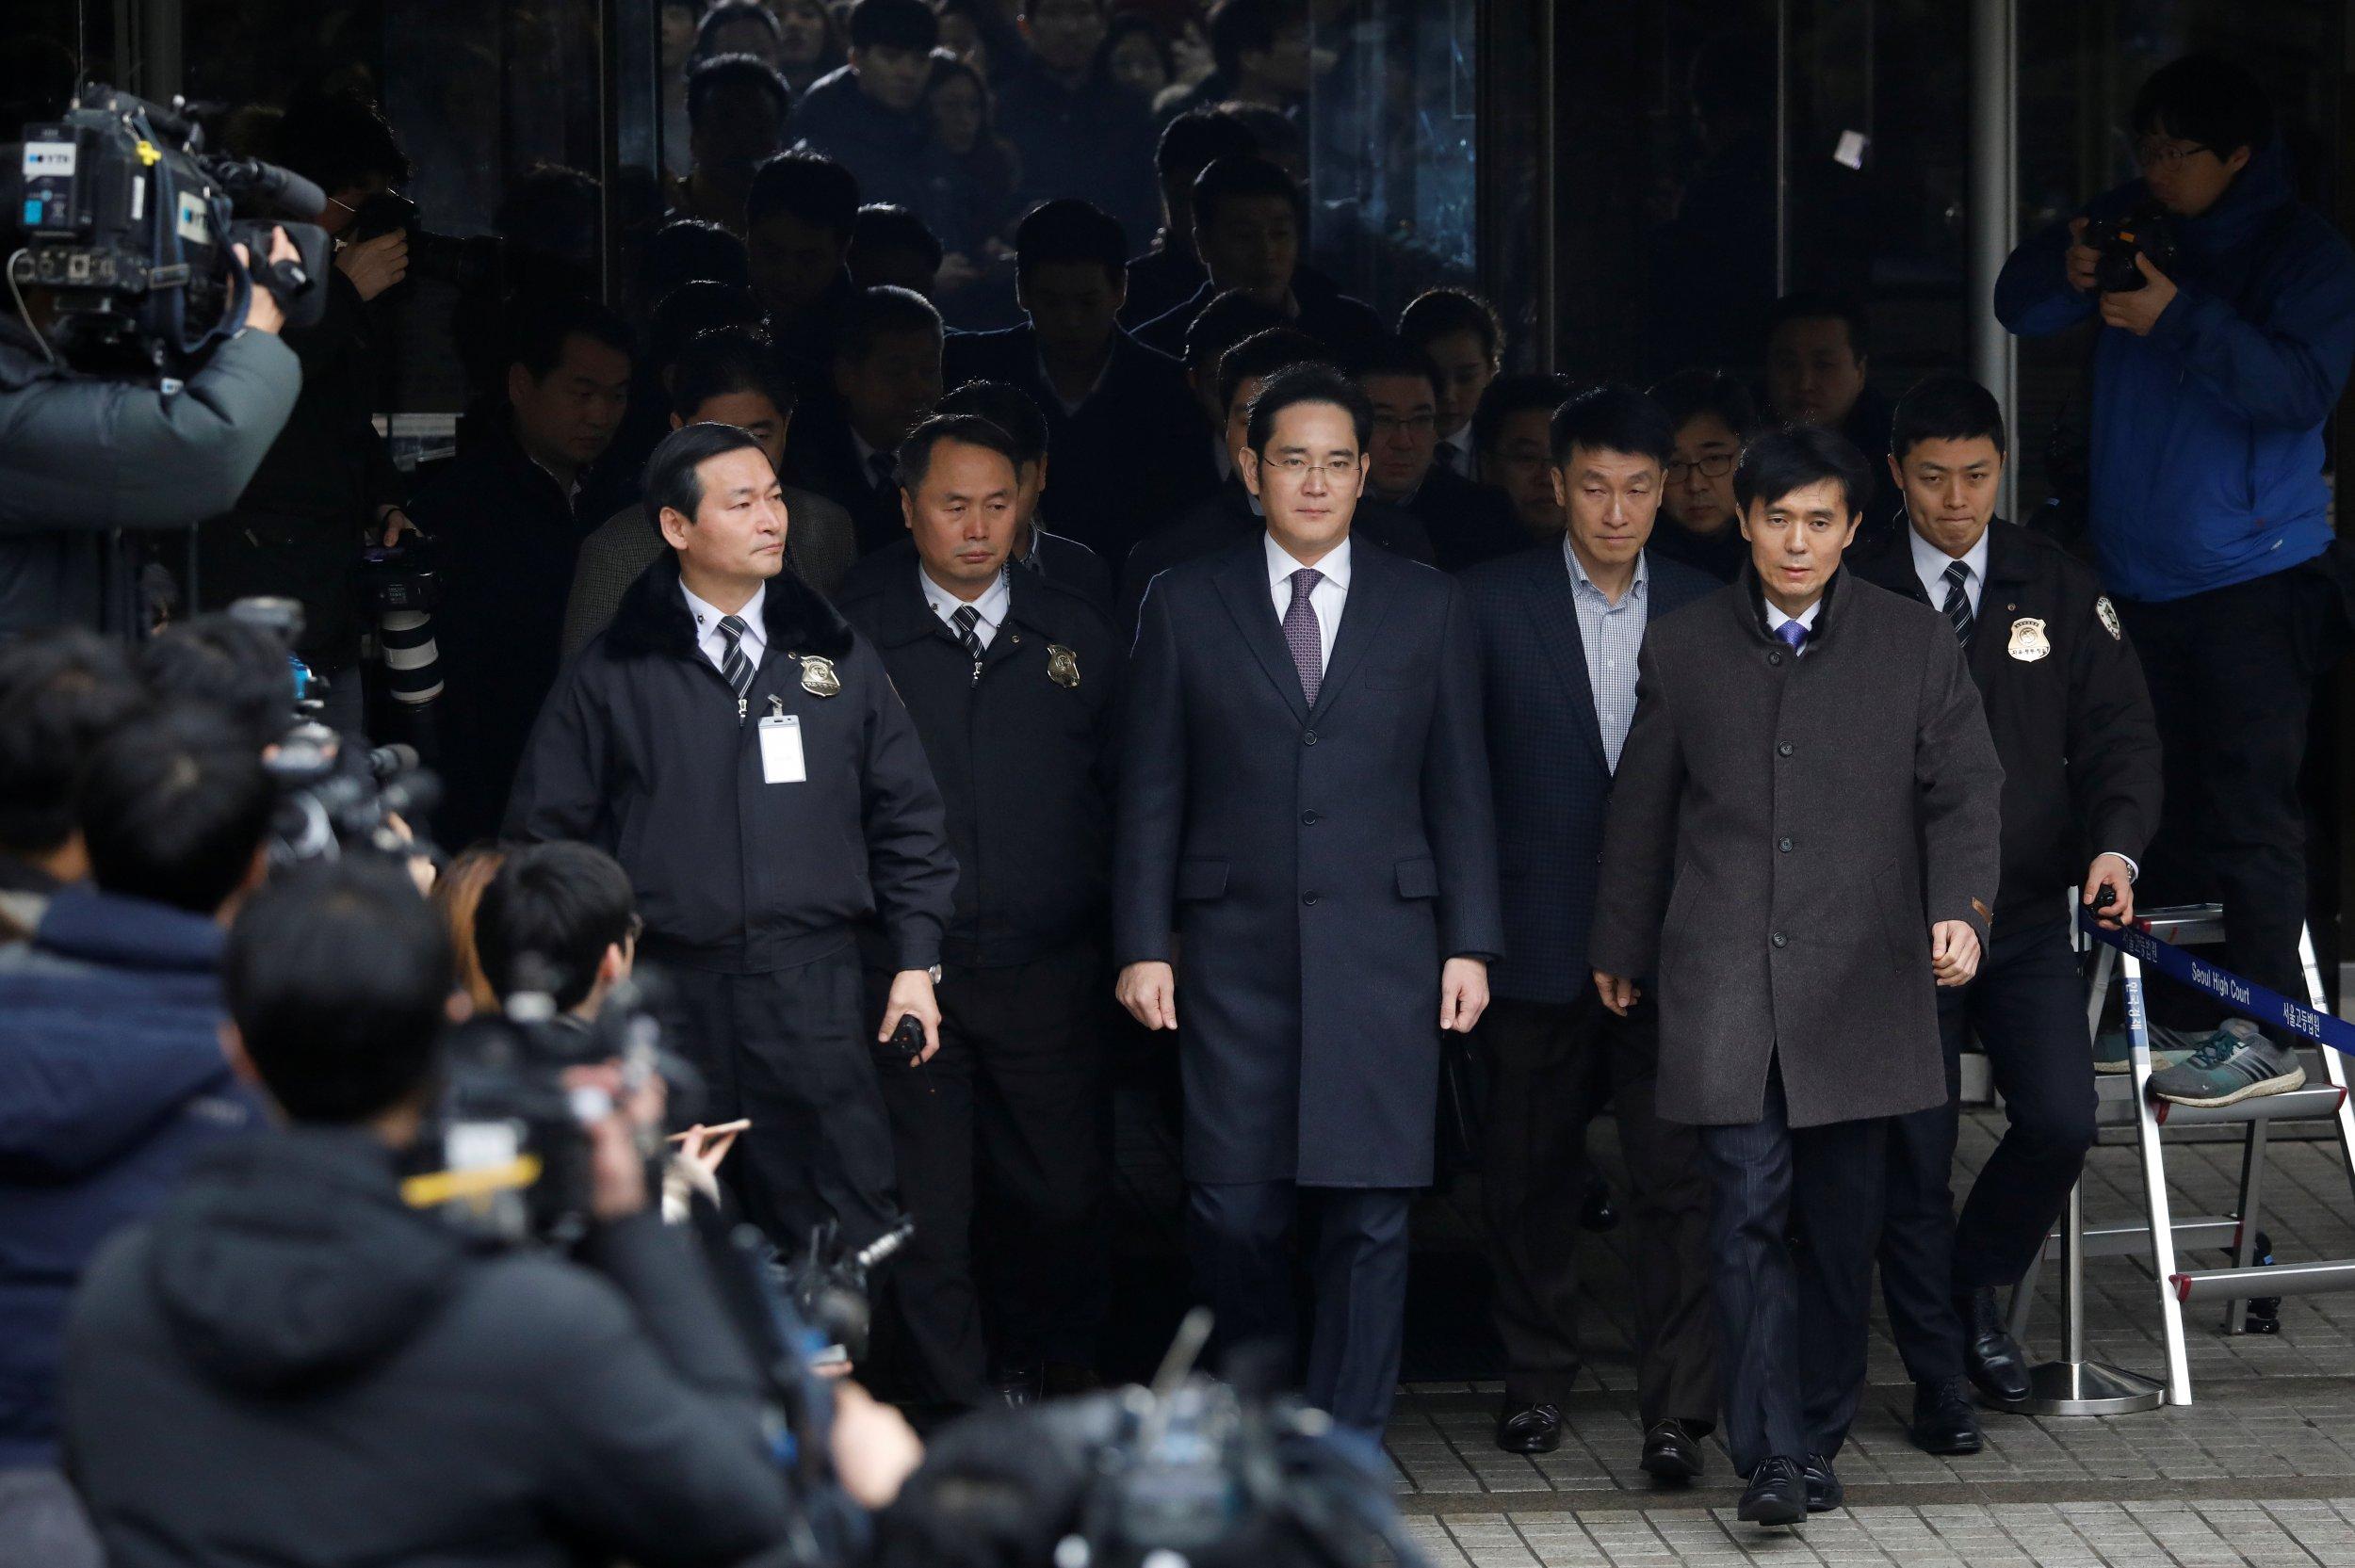 Samsung Group chief Jay Y. Lee